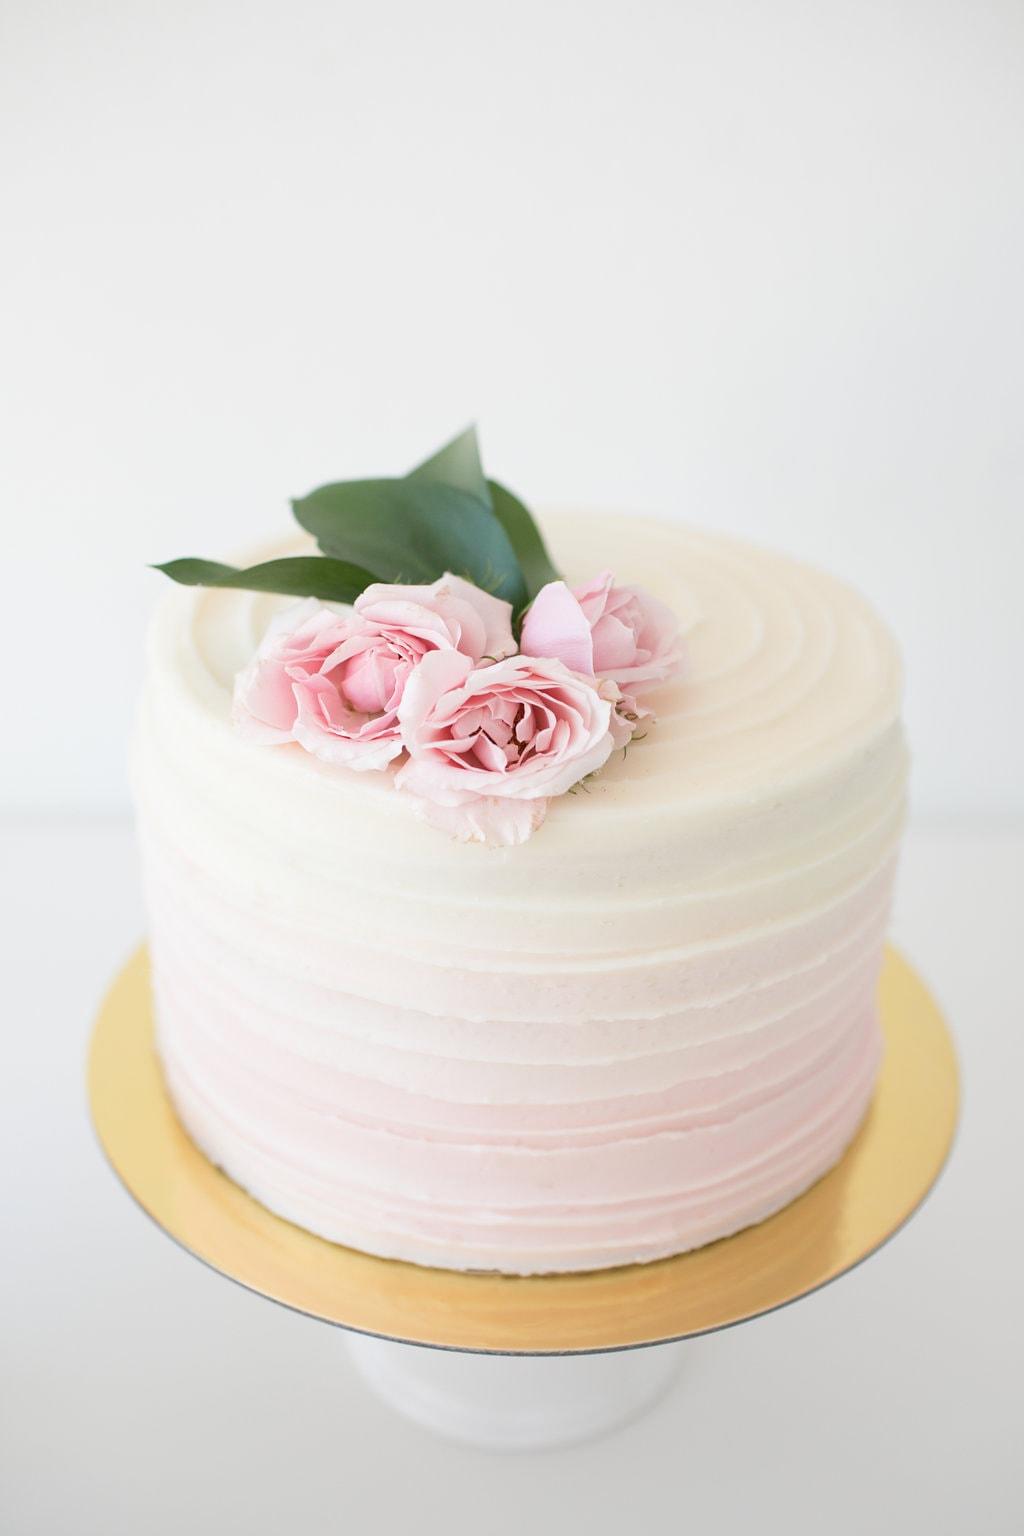 Best Vanilla Cake Vanilla Frosting Recipe Best Recipe Ever